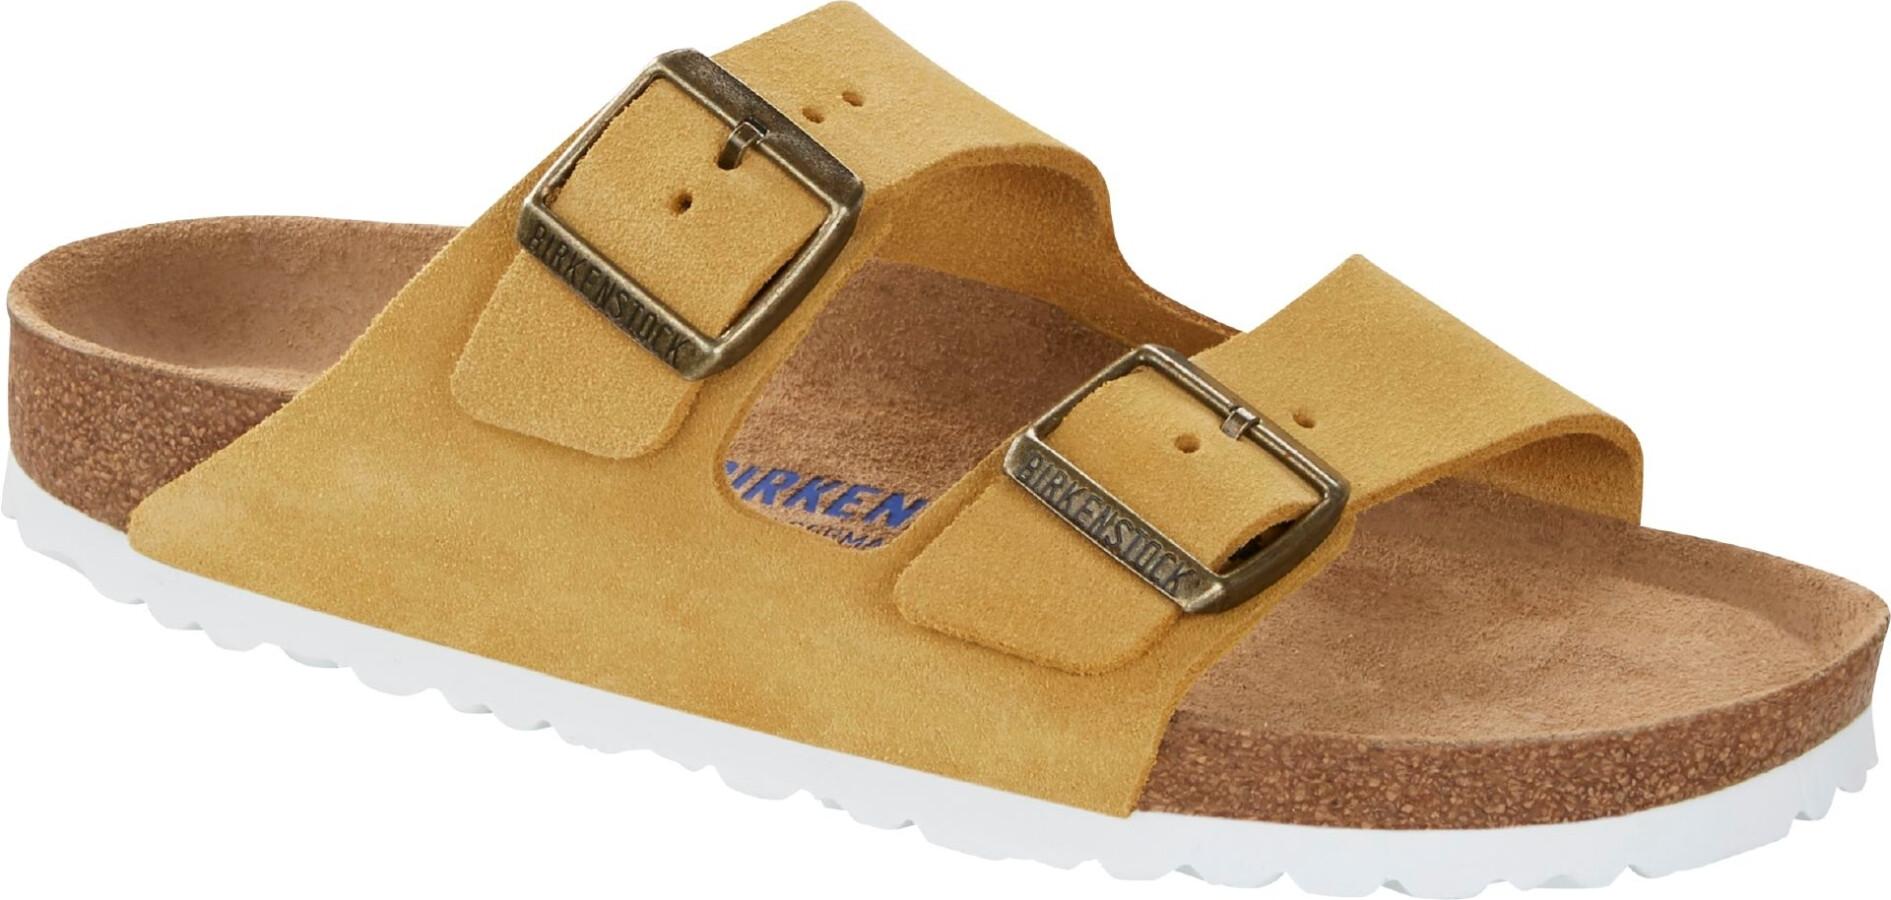 Birkenstock Arizona Soft Footbed Sandalen Wildleder Schmal Damen ochre